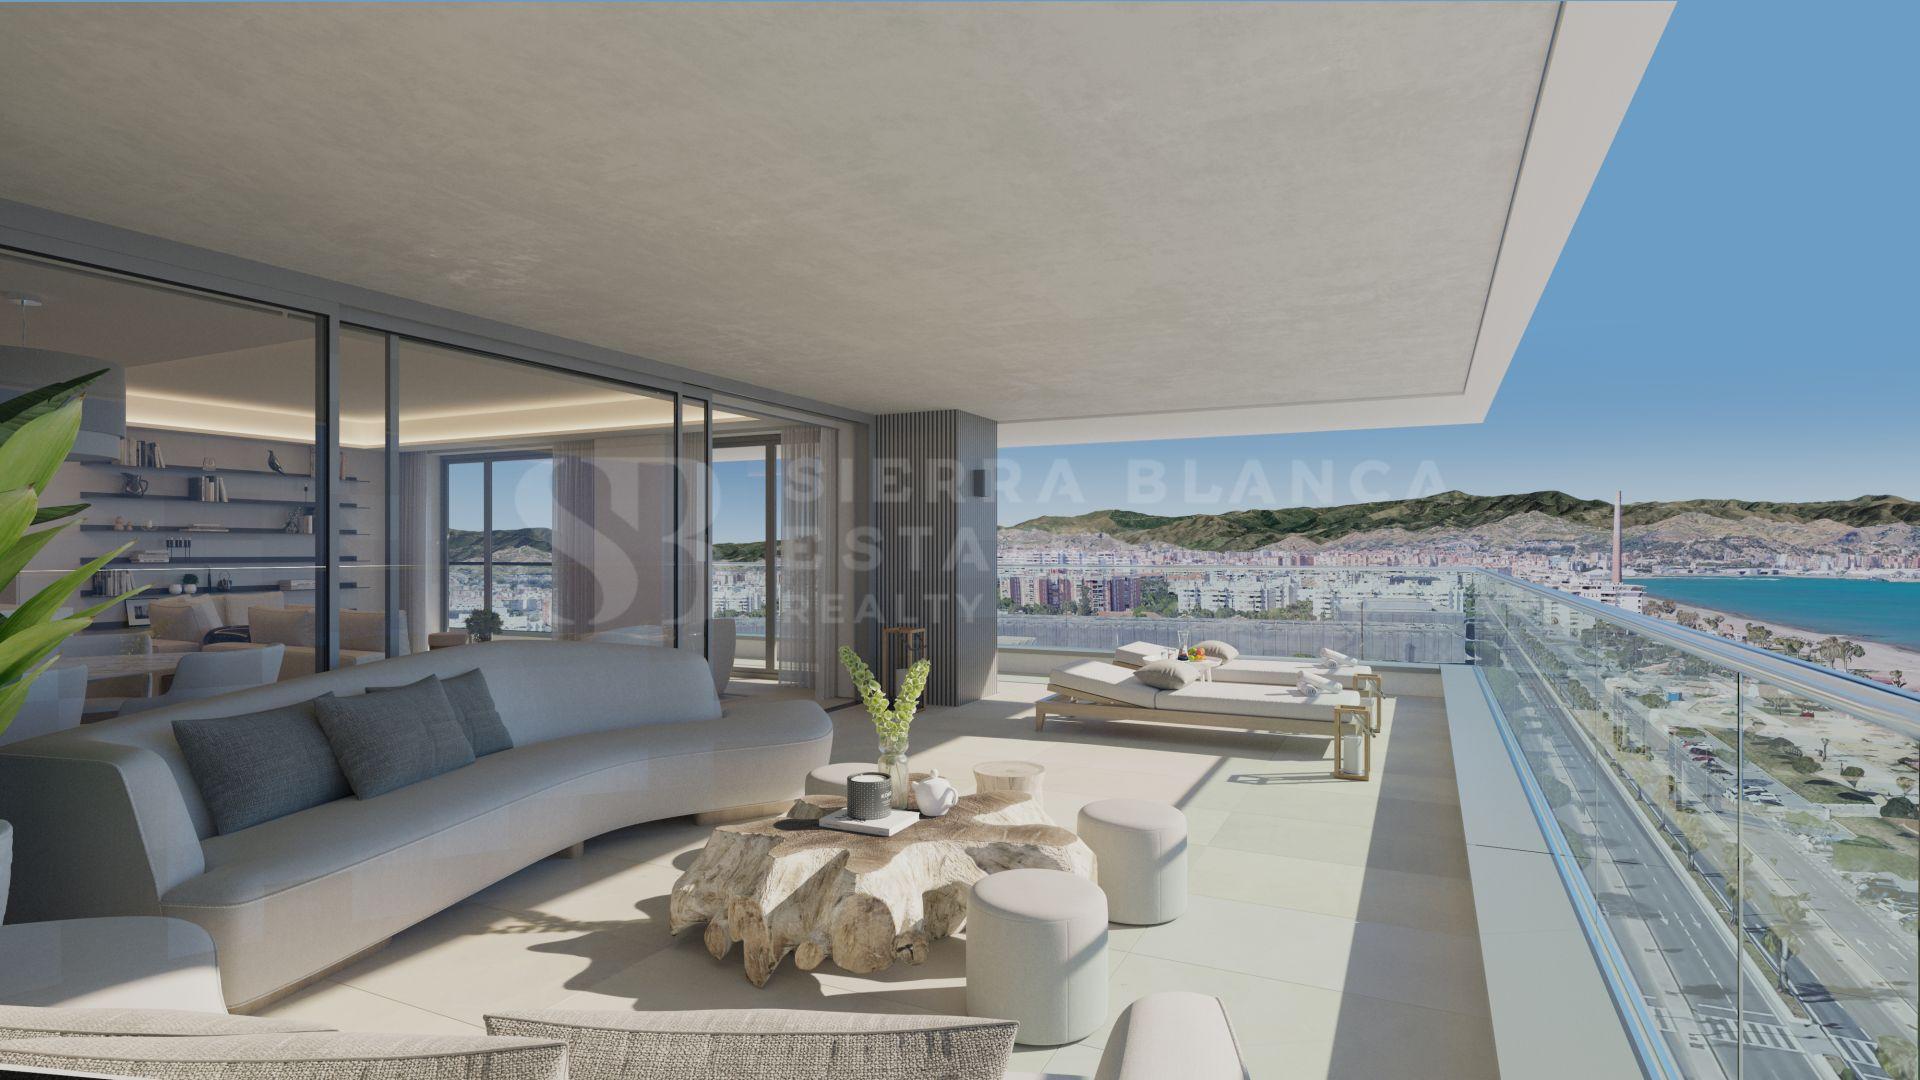 Málaga Towers - Luxury Beachfront Apartments in Malaga